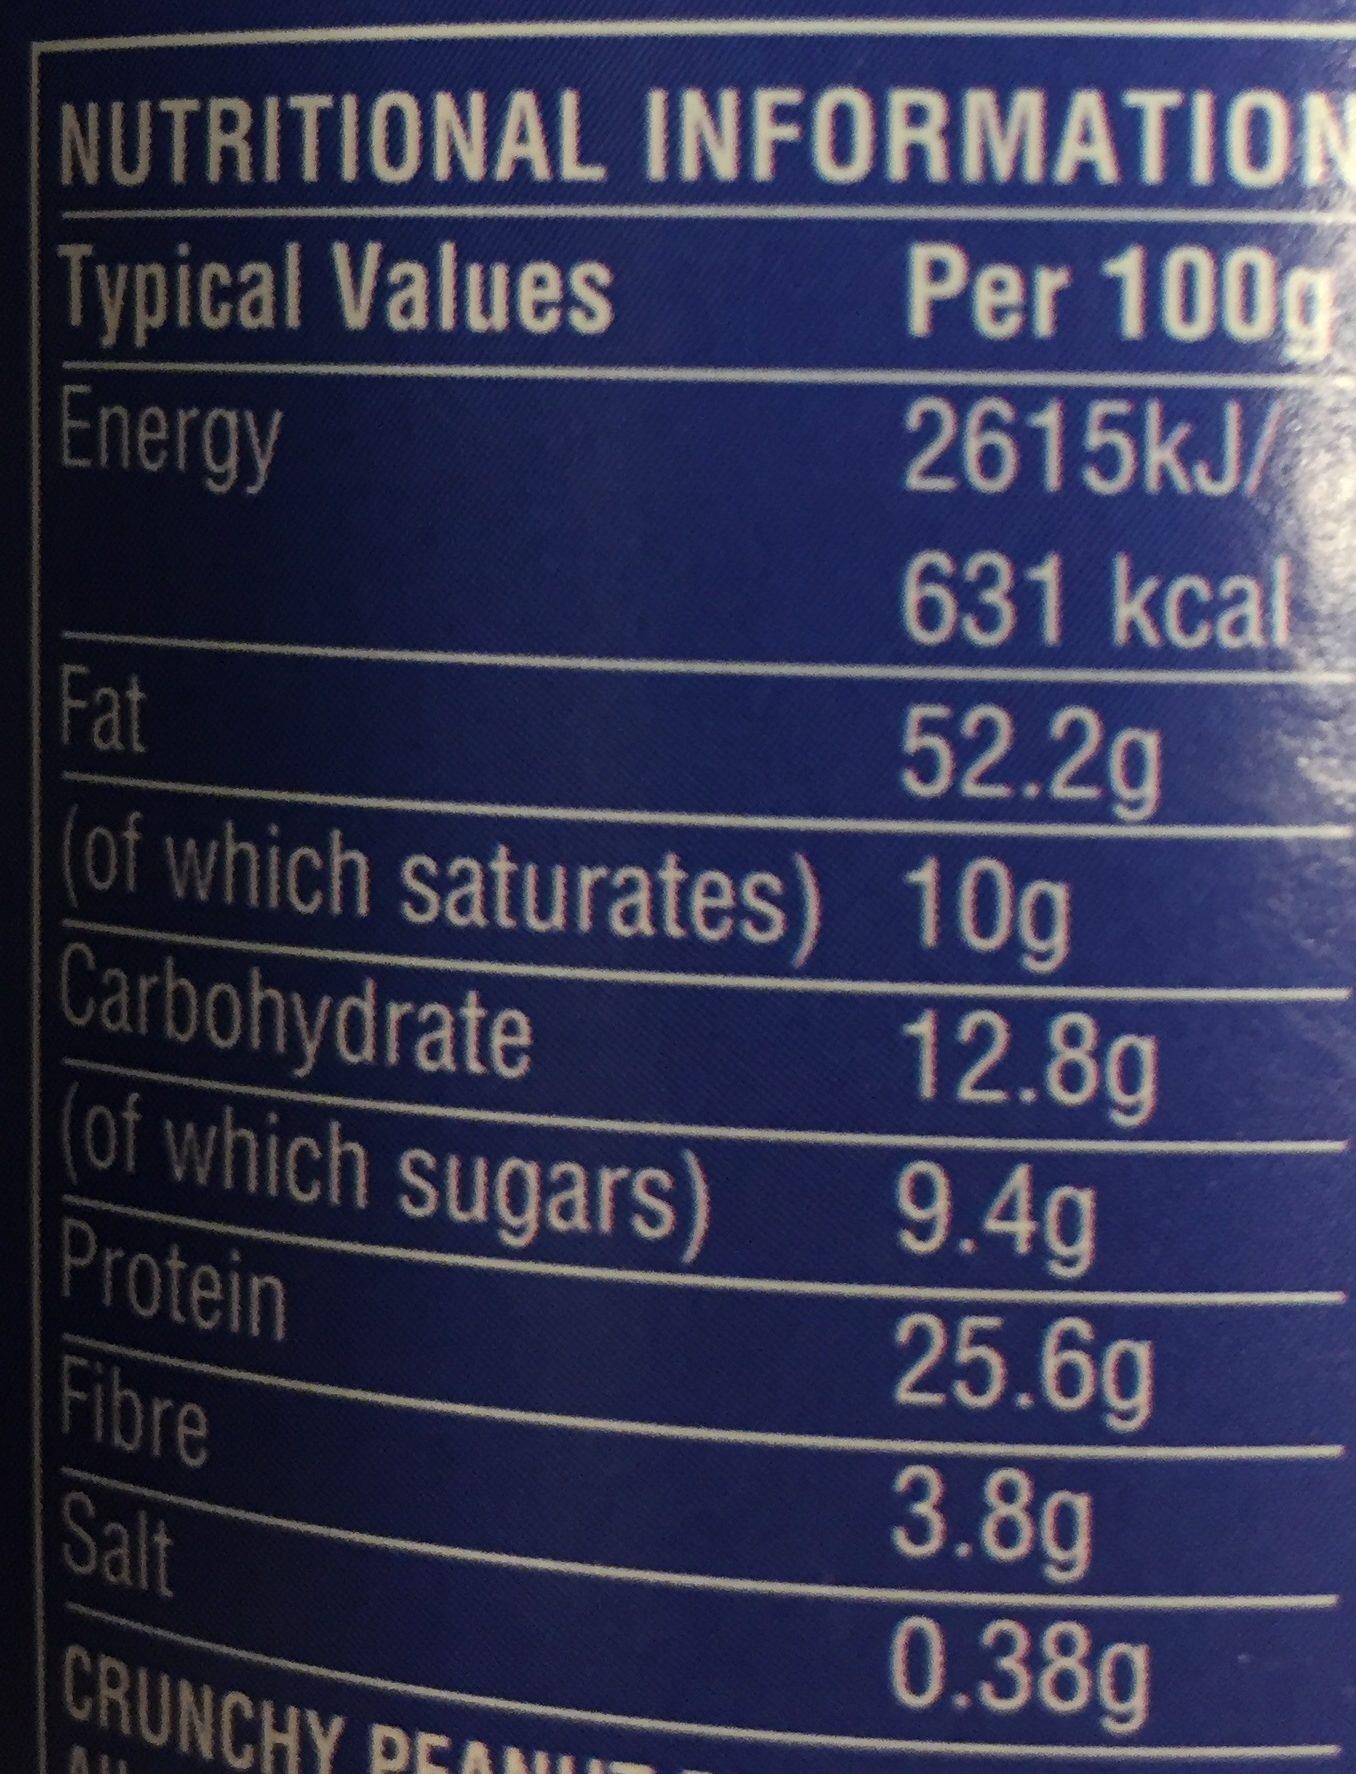 Skippy Extra Crunchy Peanut Butter 1.13KG - Nutrition facts - fr